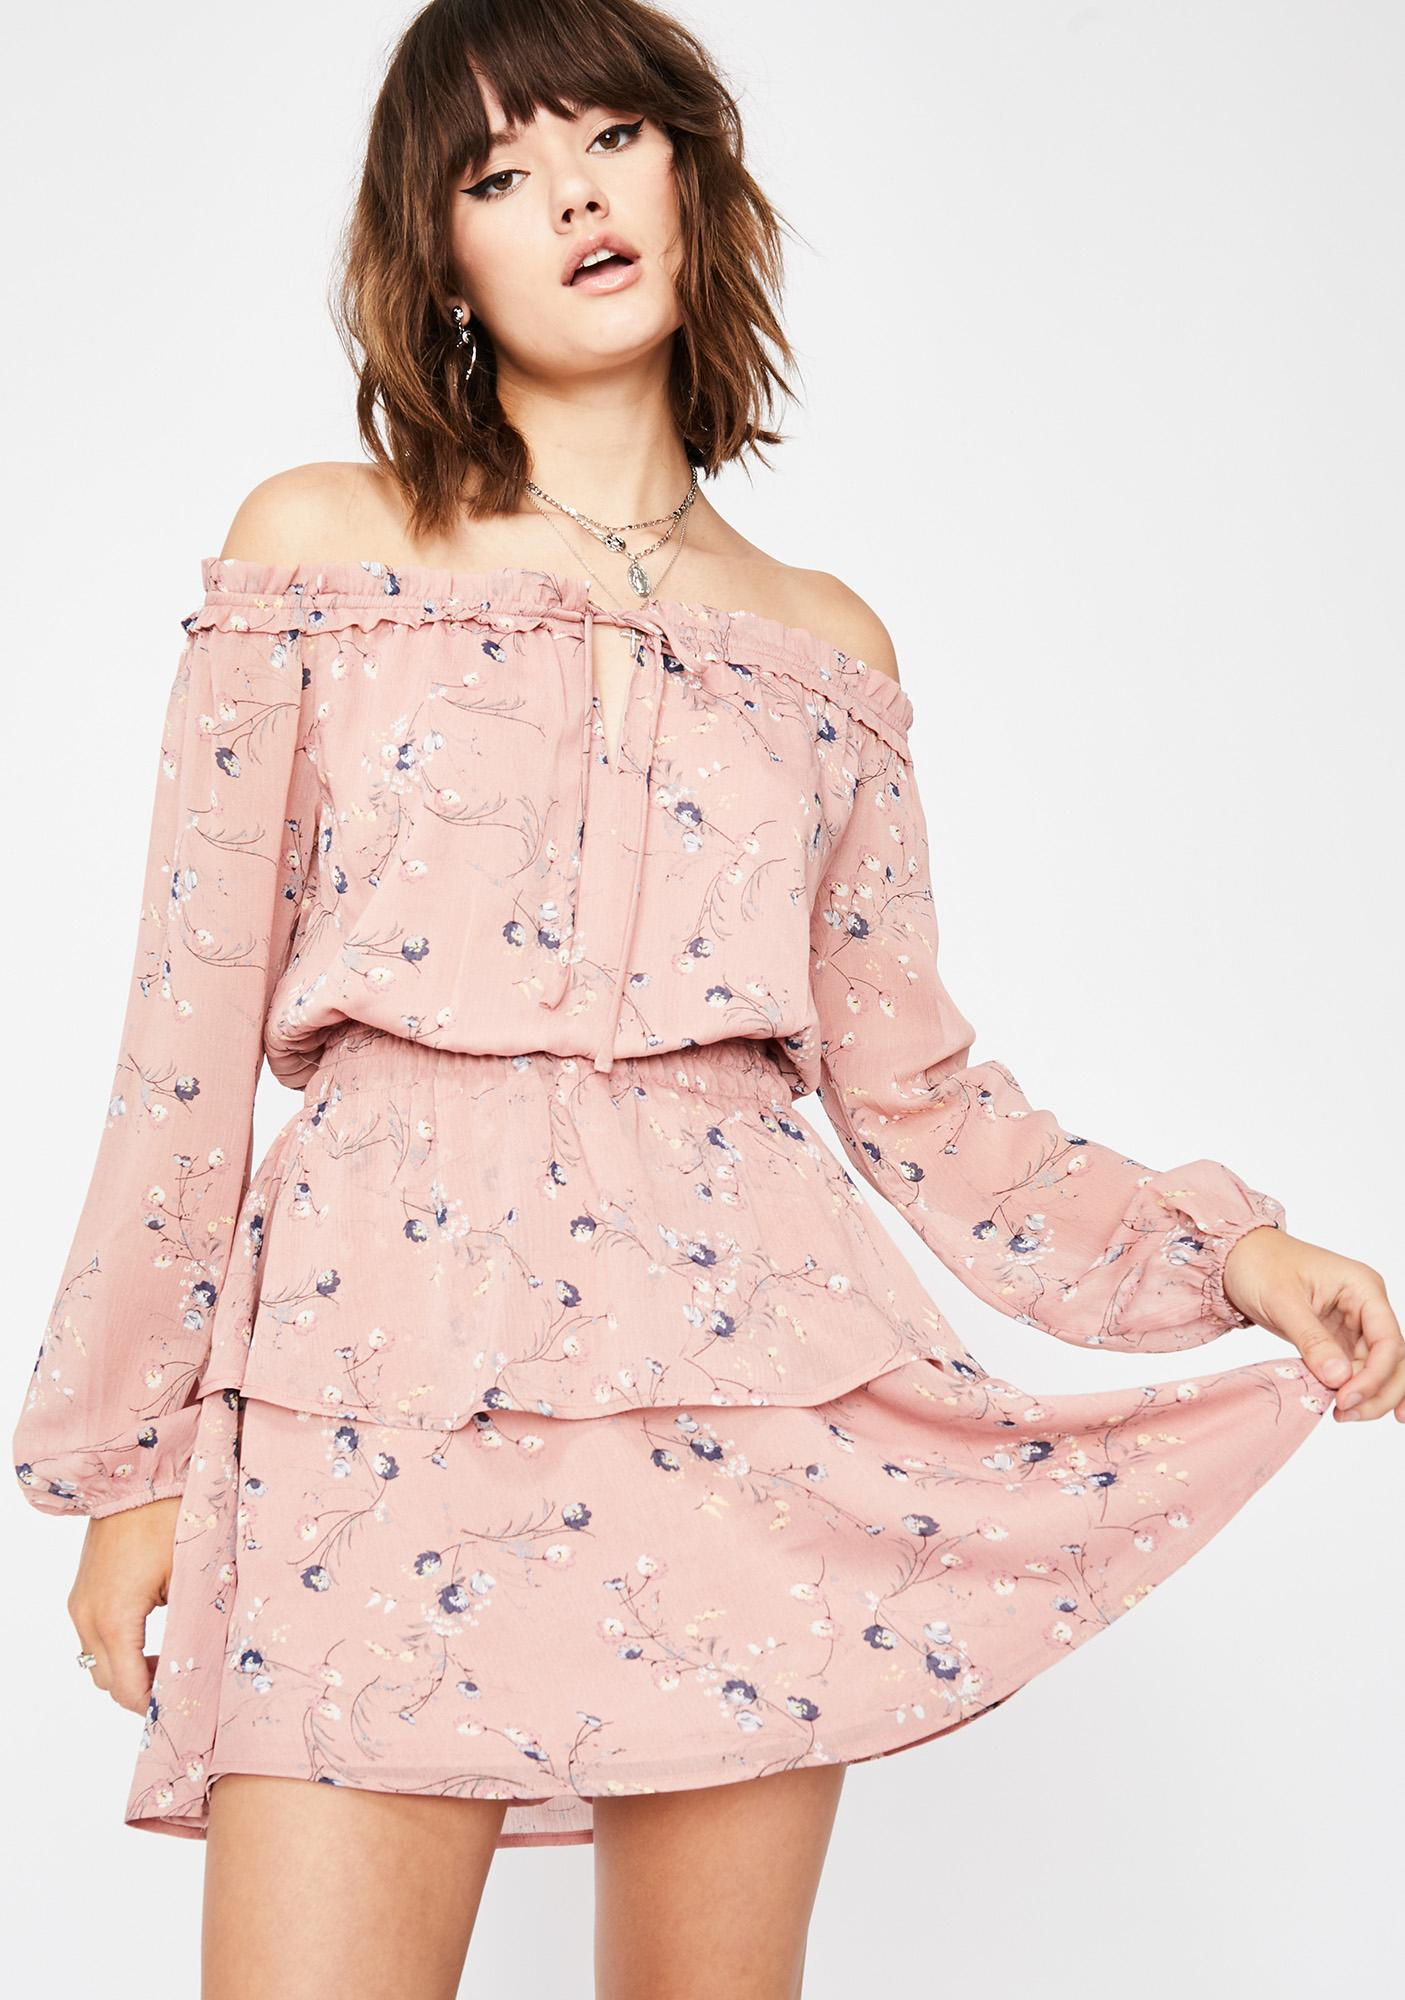 Blushin' Dixie Dance Floral Dress